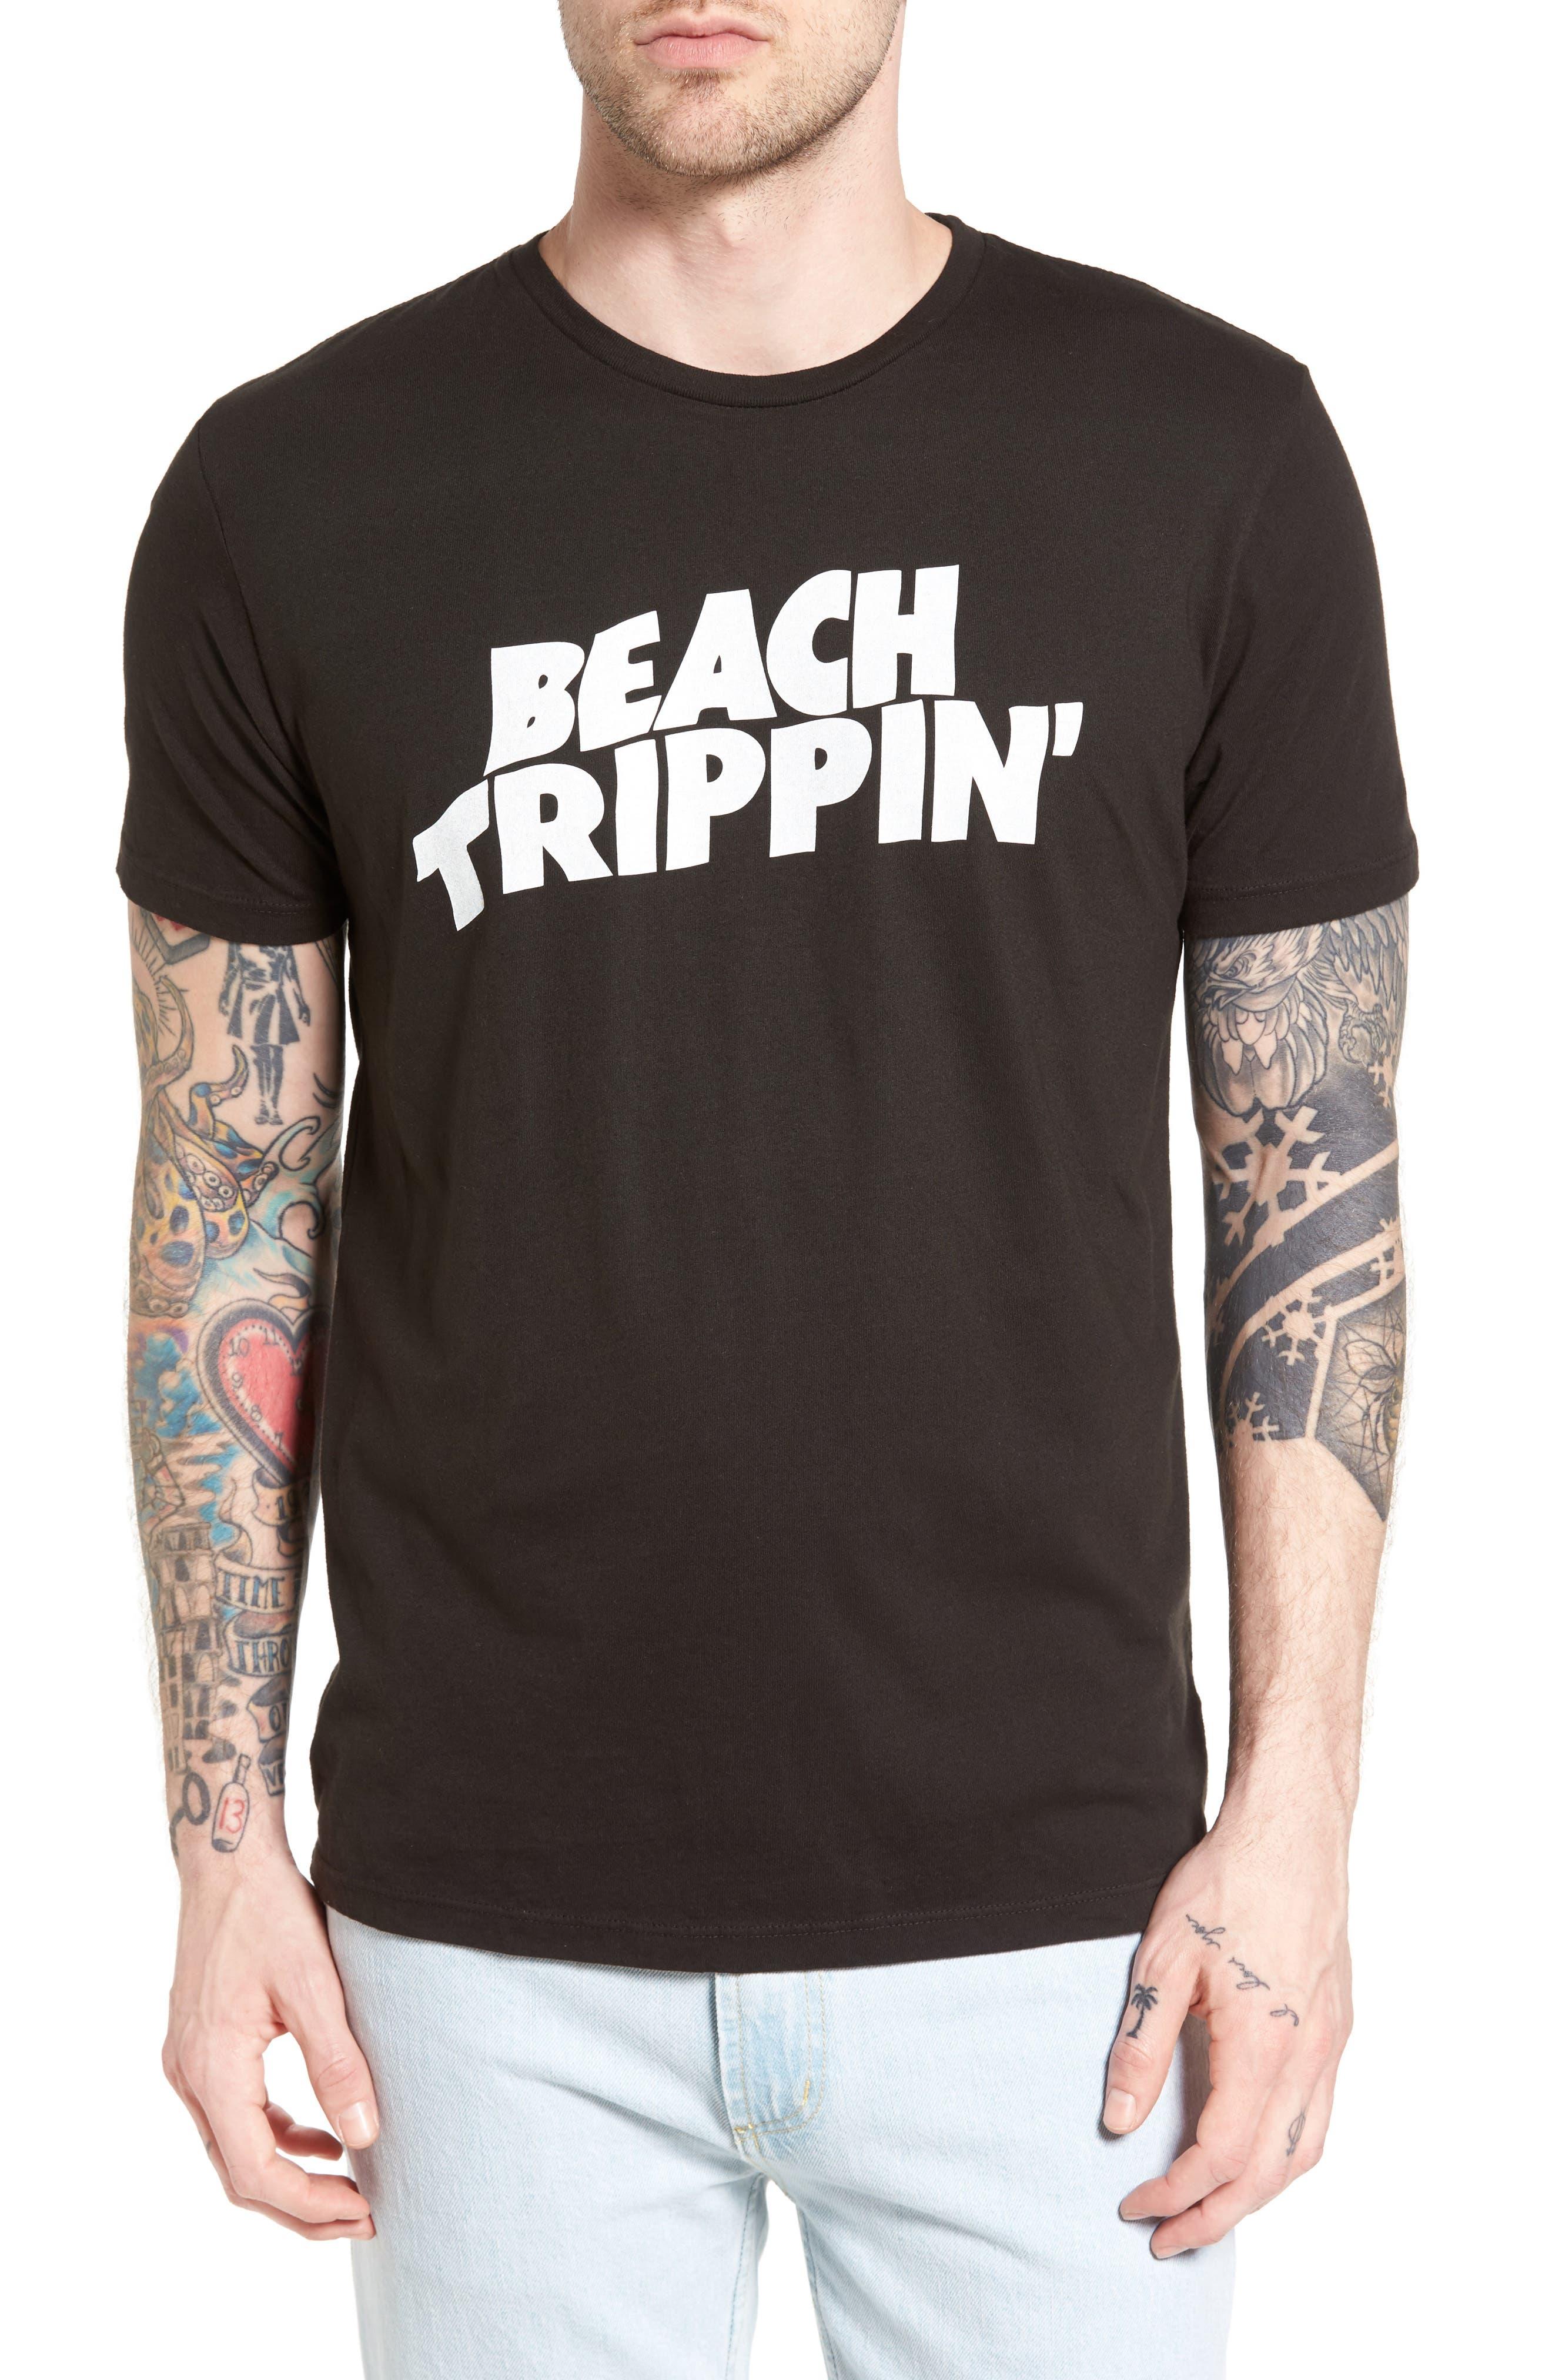 Beach Trippin' Graphic T-Shirt,                         Main,                         color, Graphite